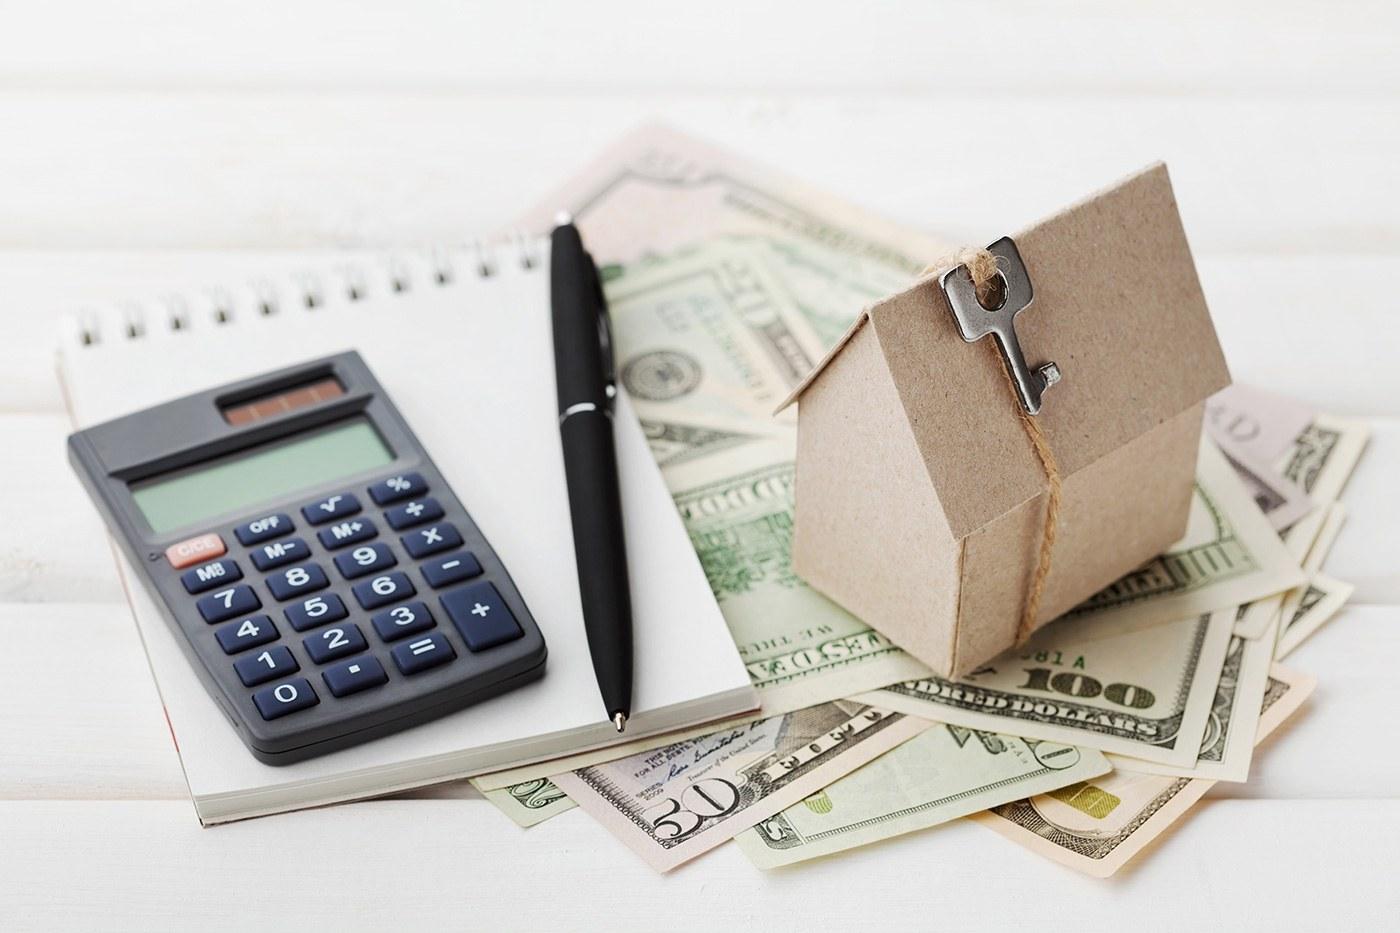 calculator pen money notepad